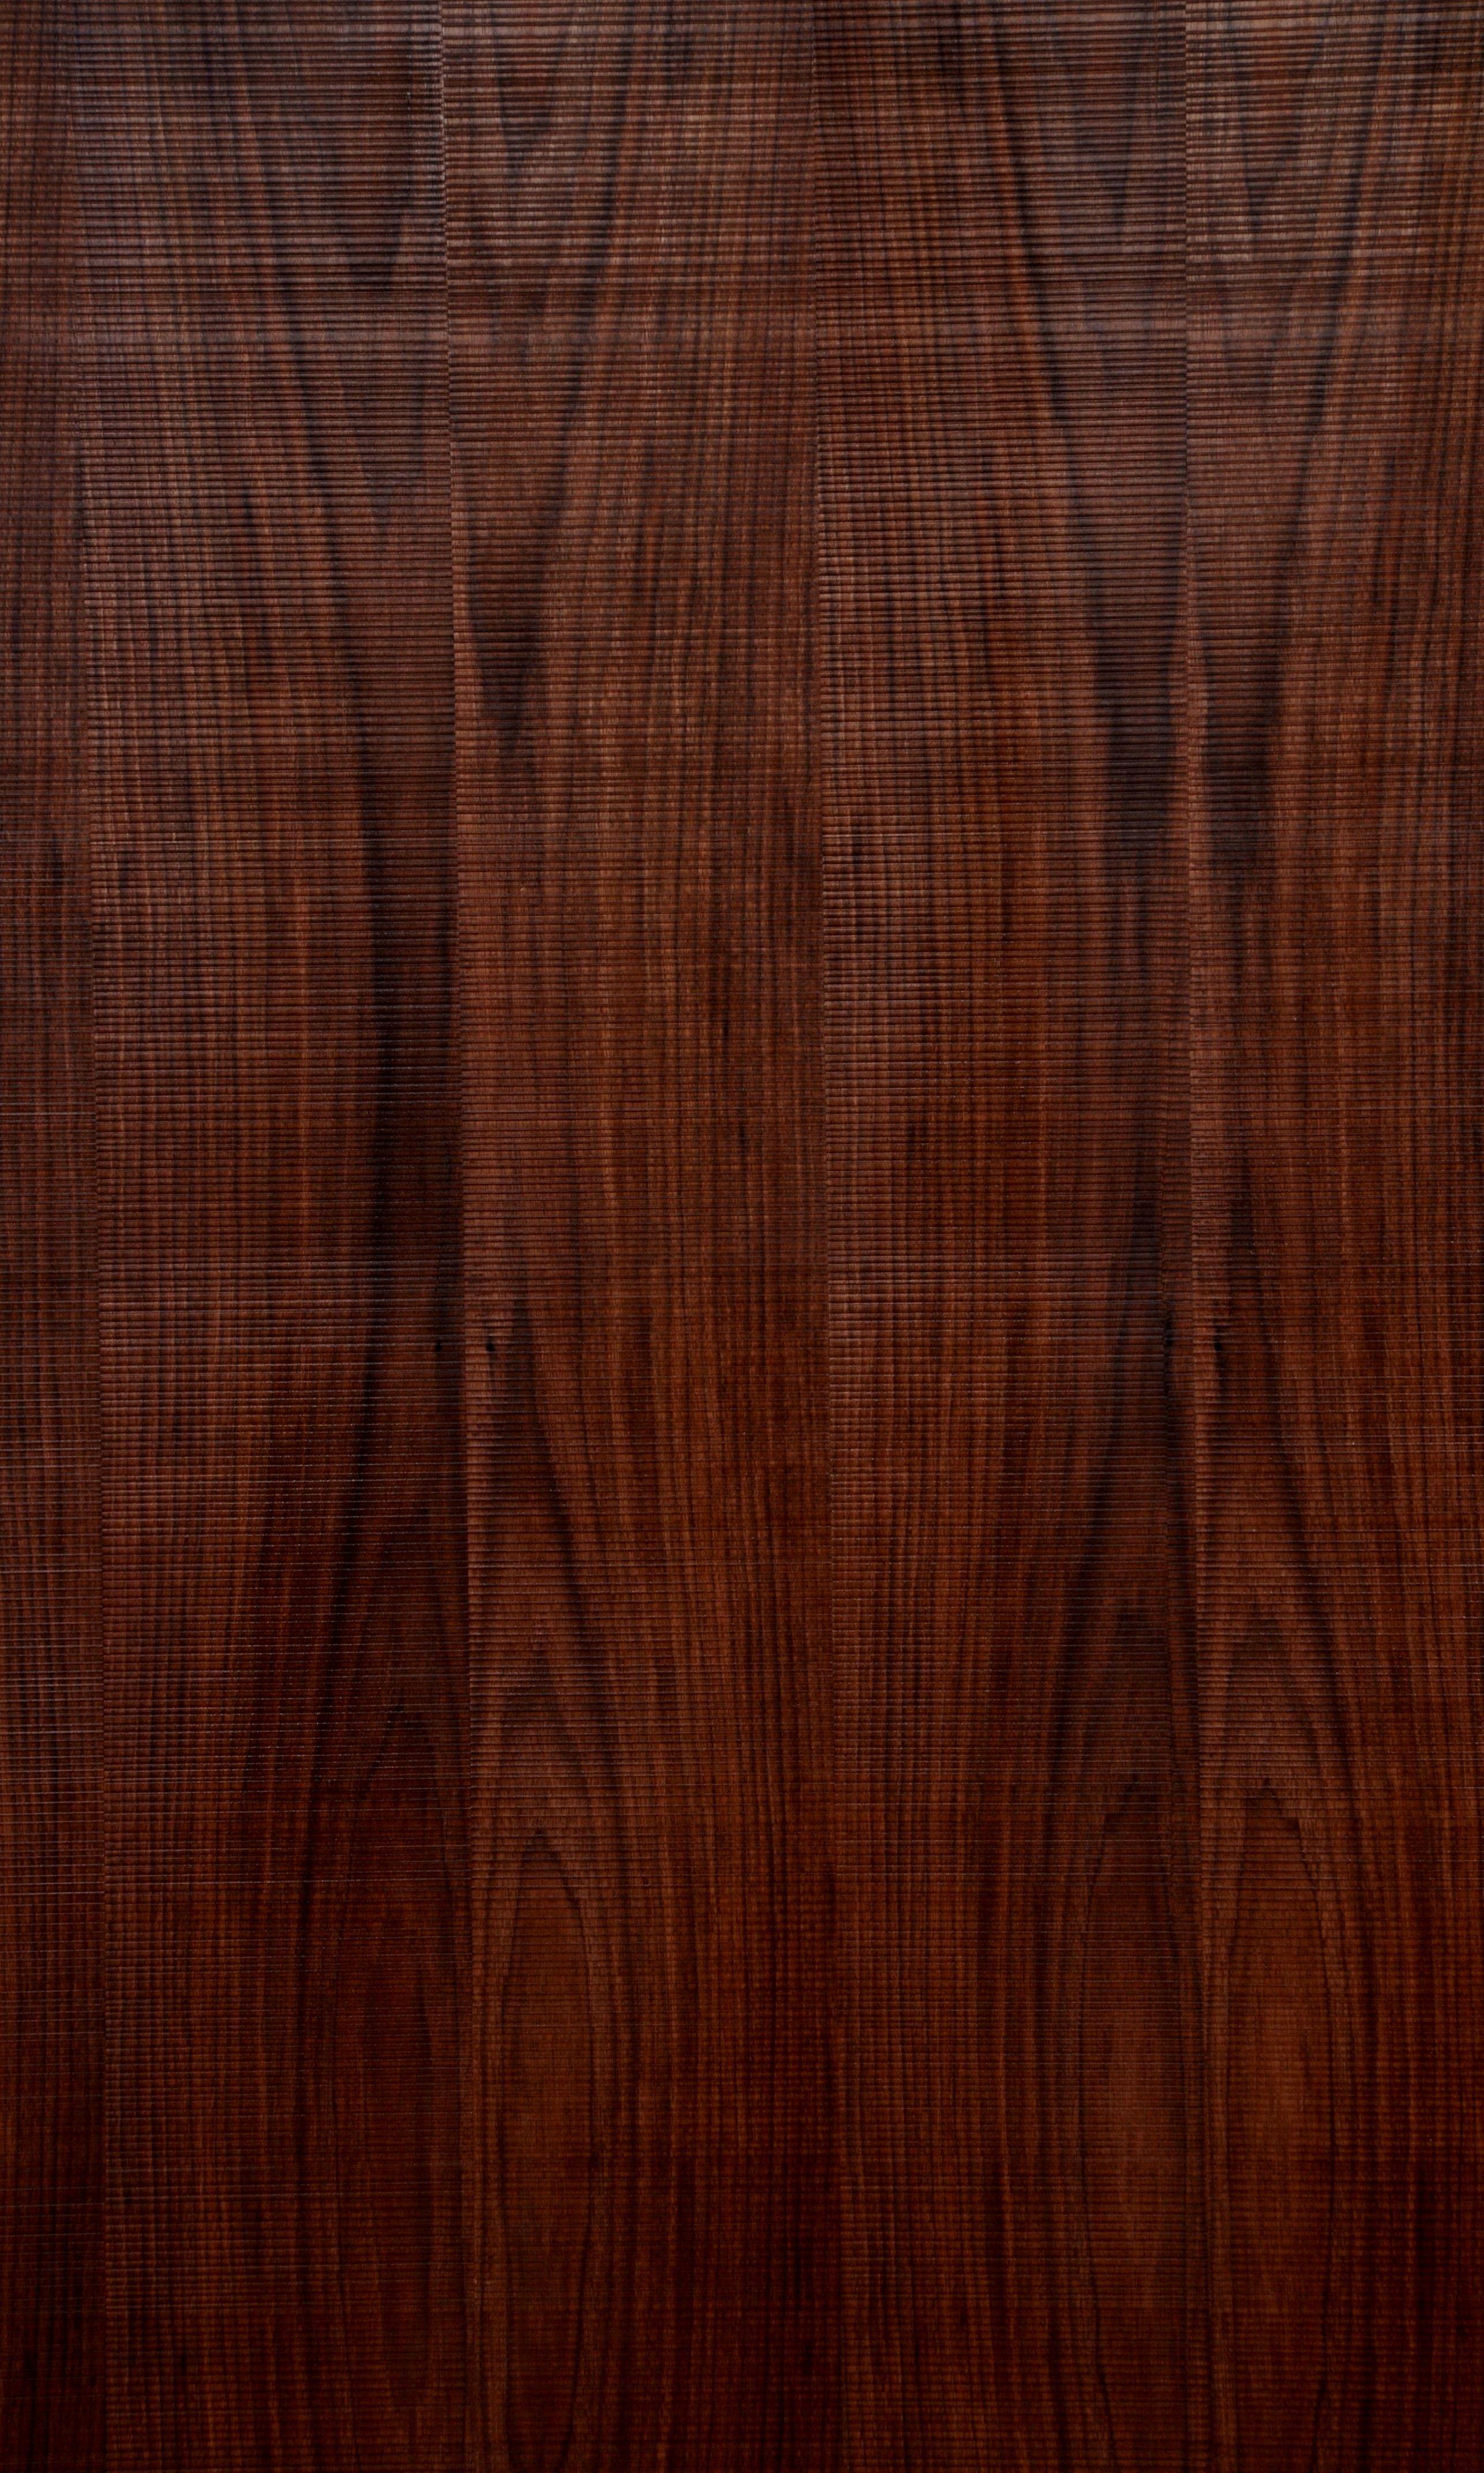 American Black Walnut Flat Cut Rough Cut Wood Veneer New